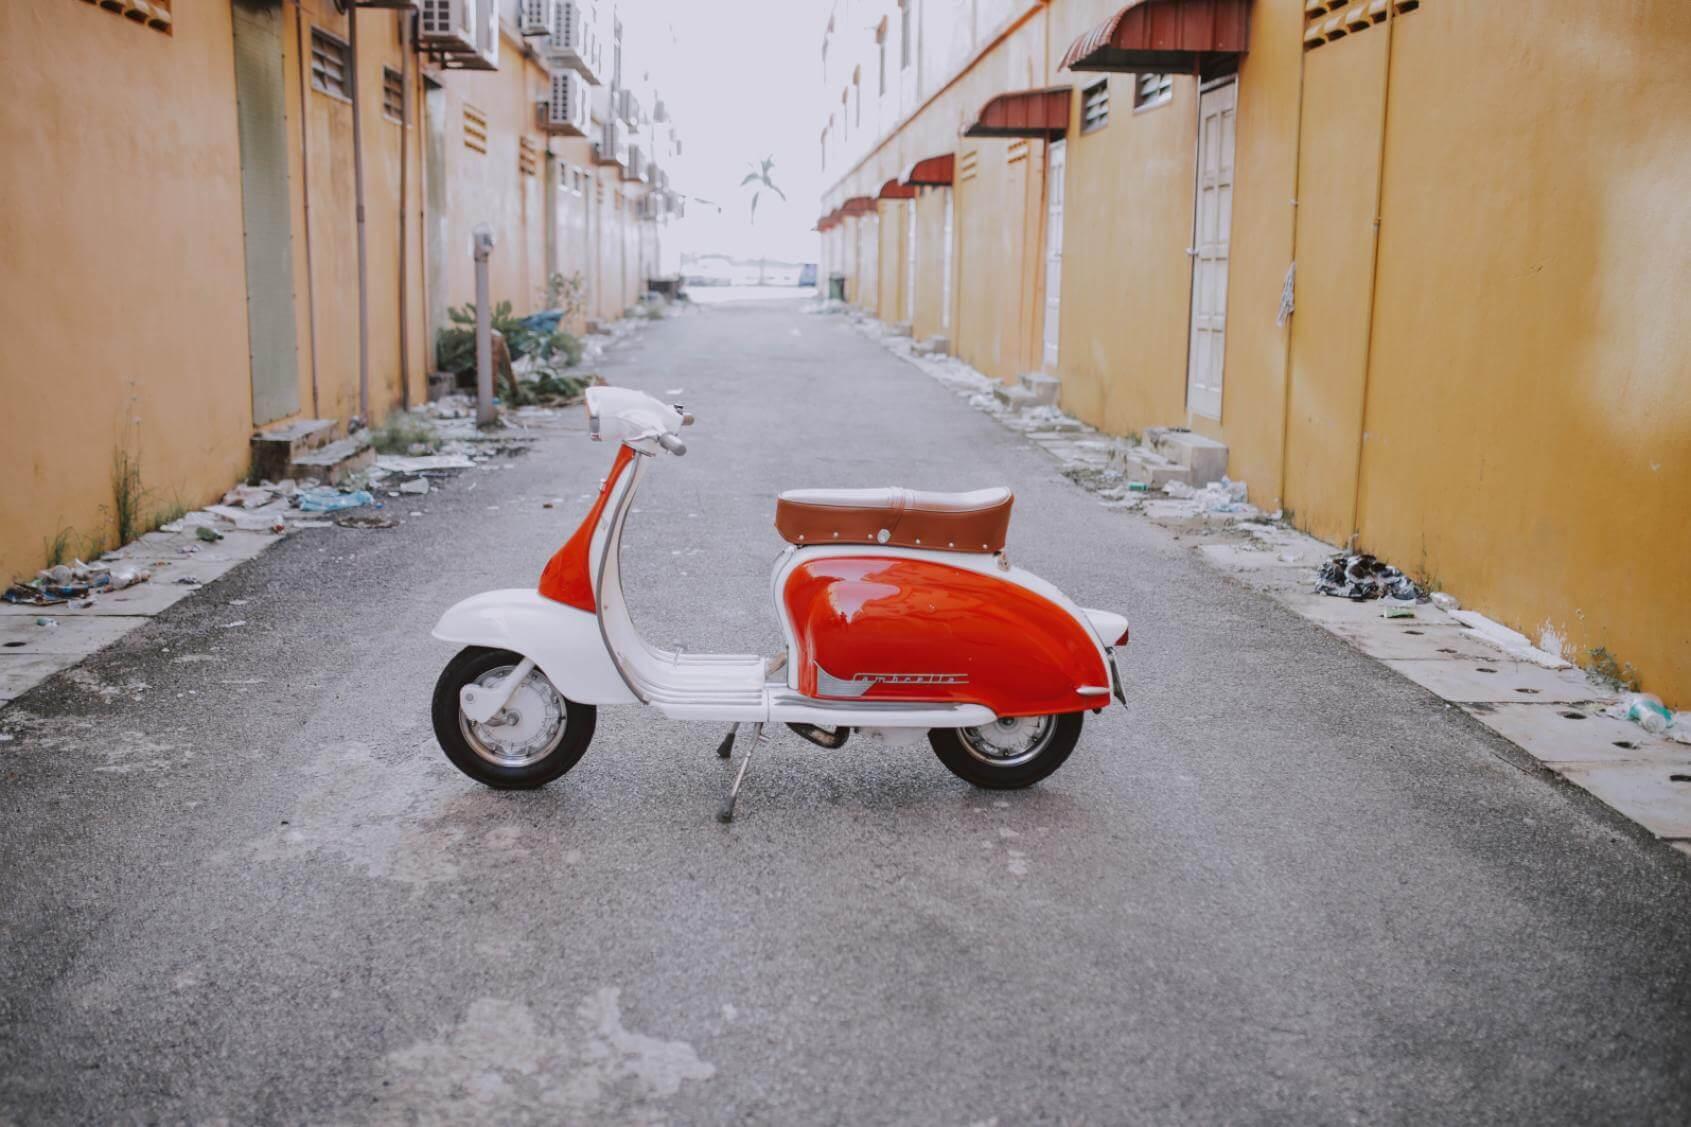 Motor Scooter Lambretta - Original image